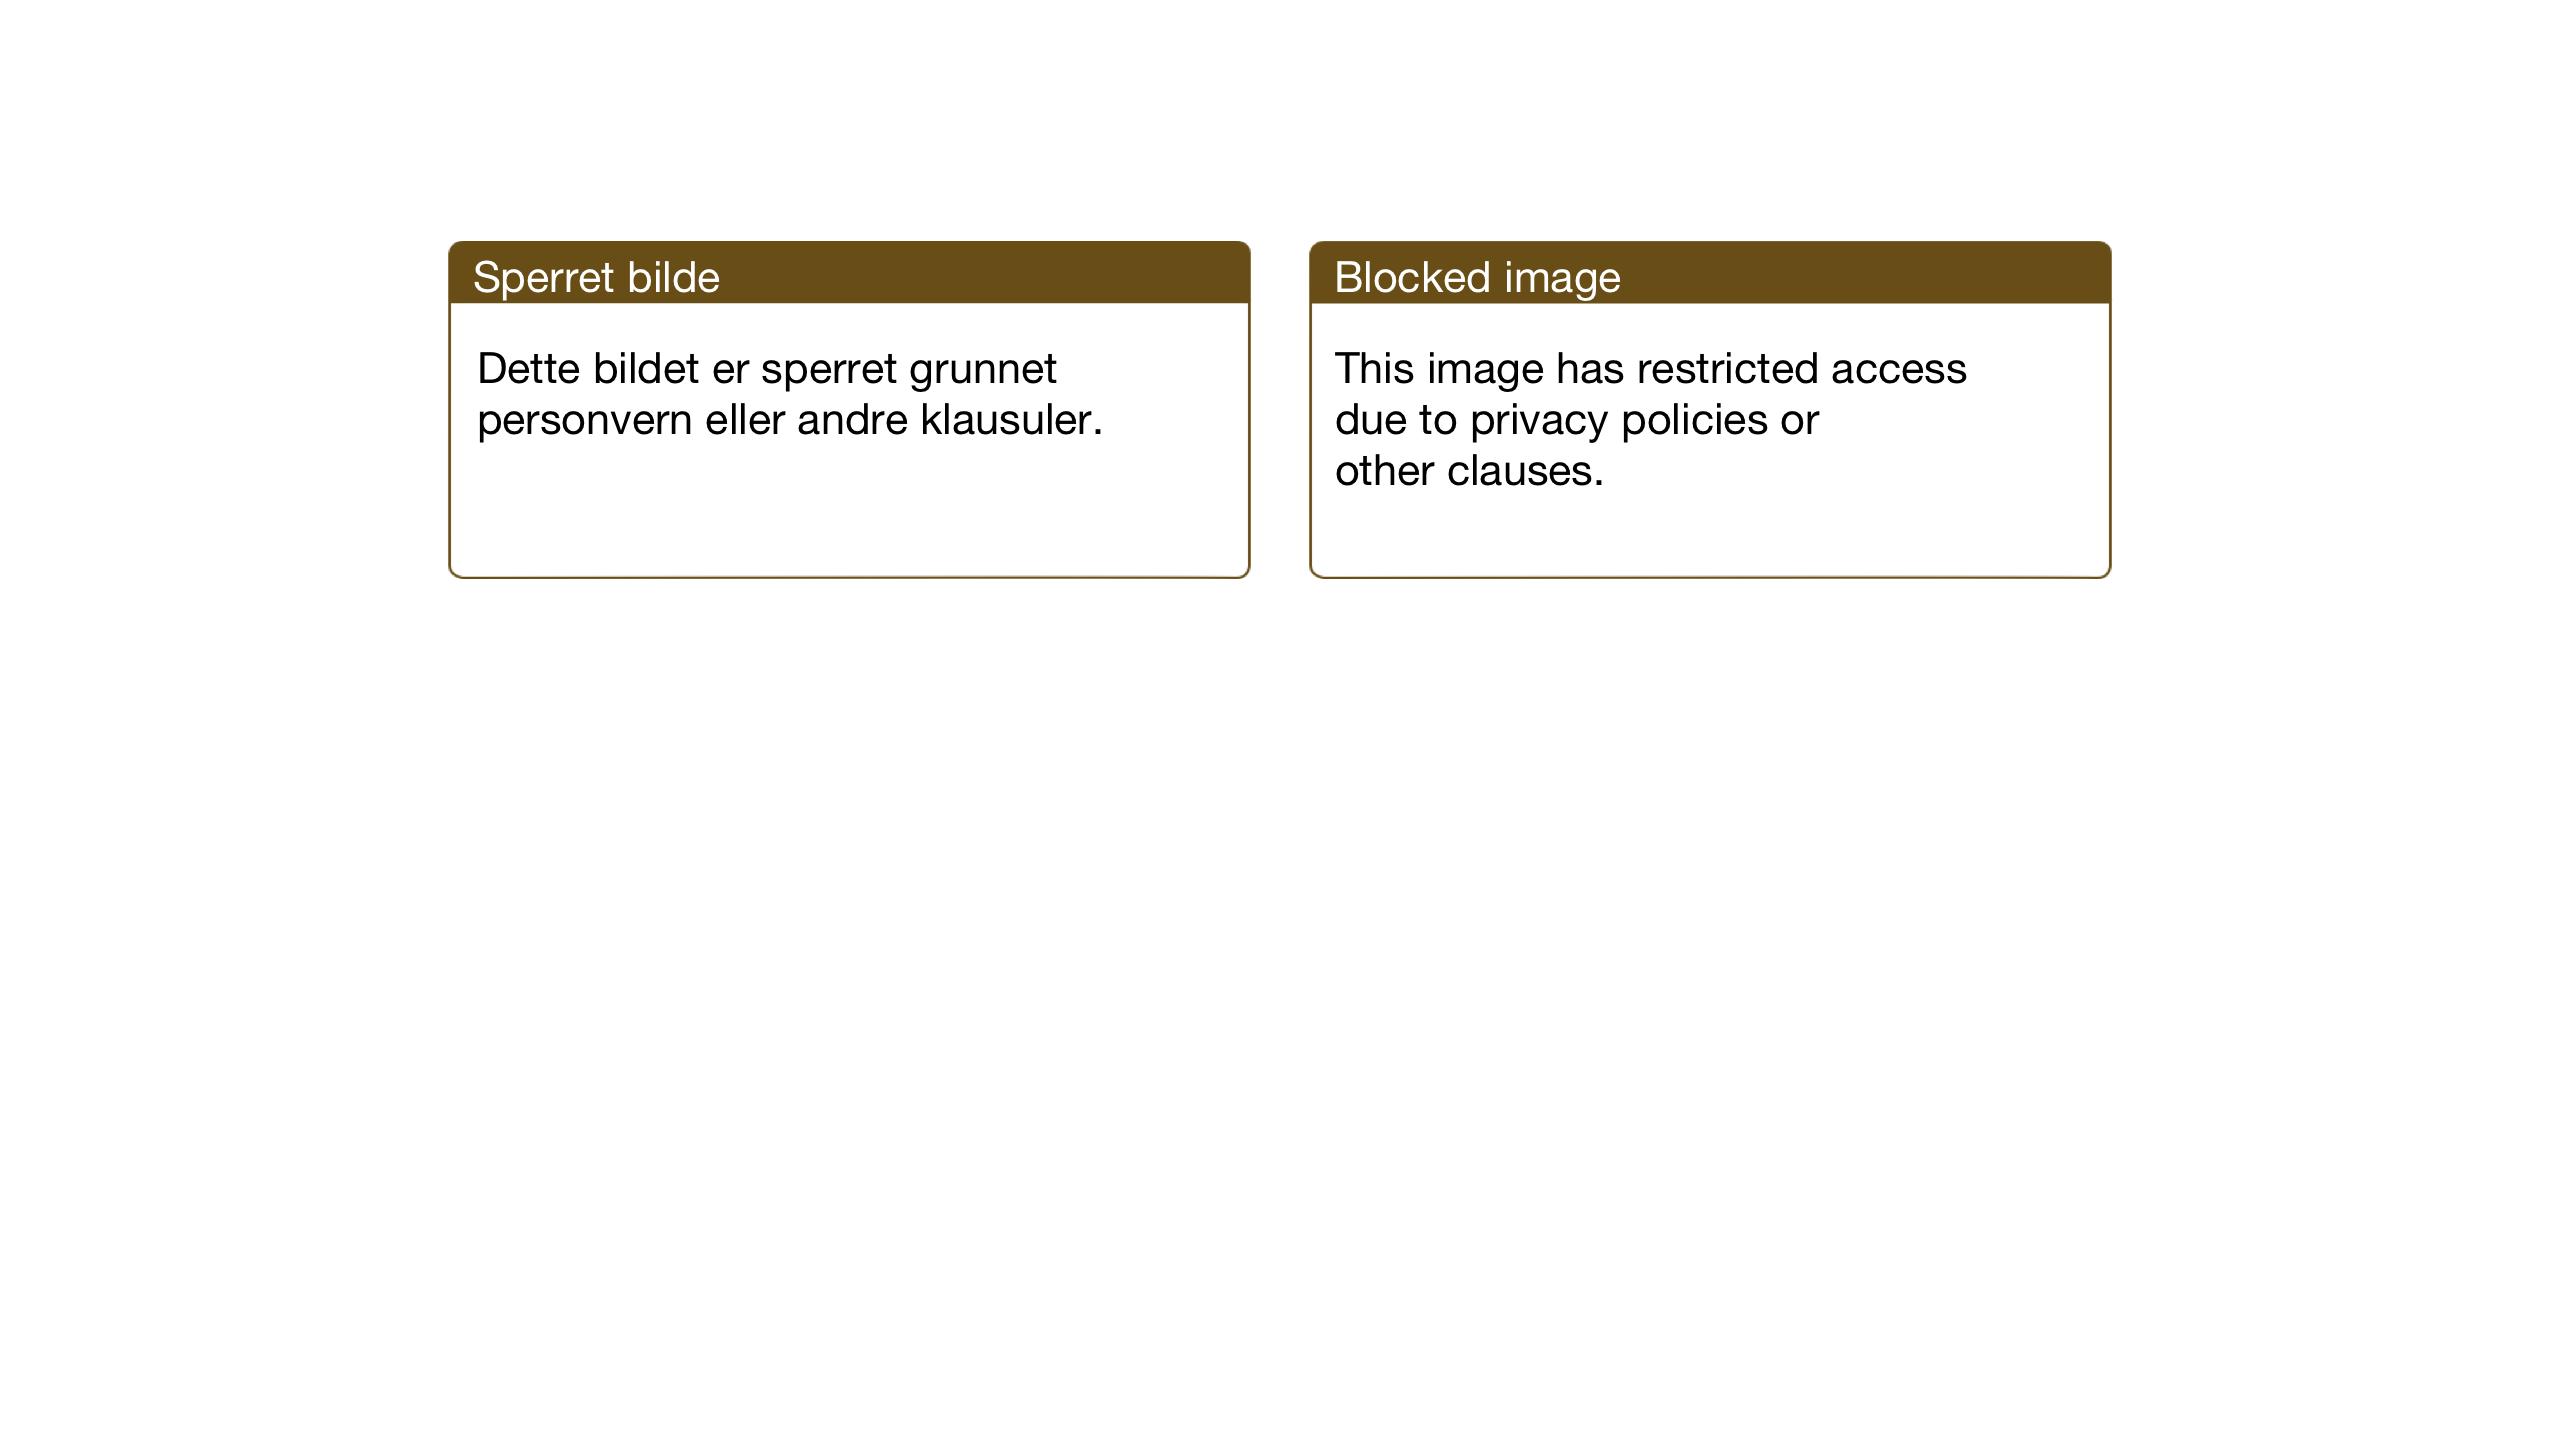 SAT, Ministerialprotokoller, klokkerbøker og fødselsregistre - Sør-Trøndelag, 621/L0462: Parish register (copy) no. 621C05, 1915-1945, p. 41